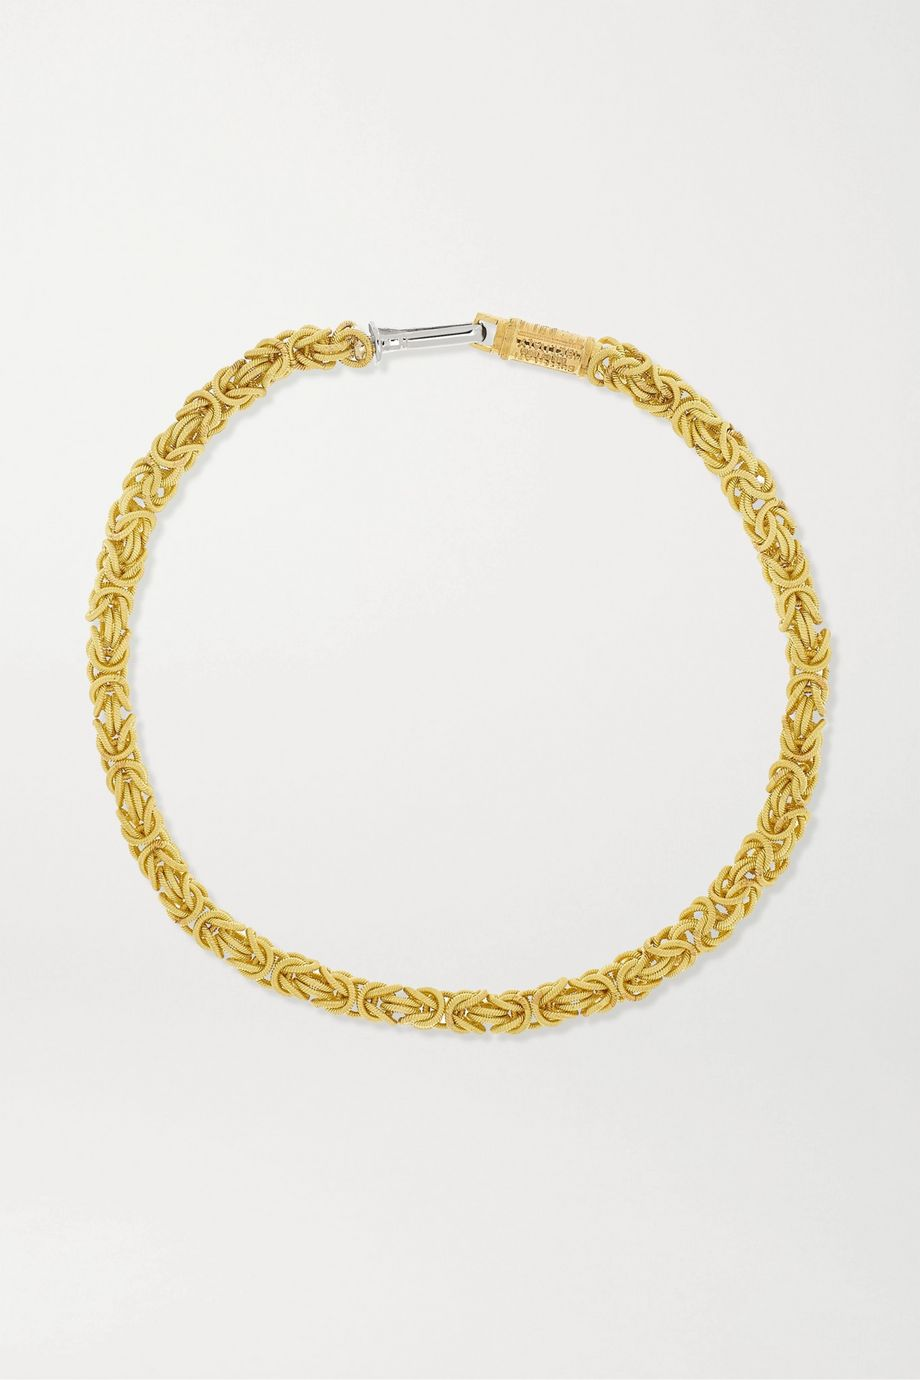 Buccellati Reale 18K 黄金手链